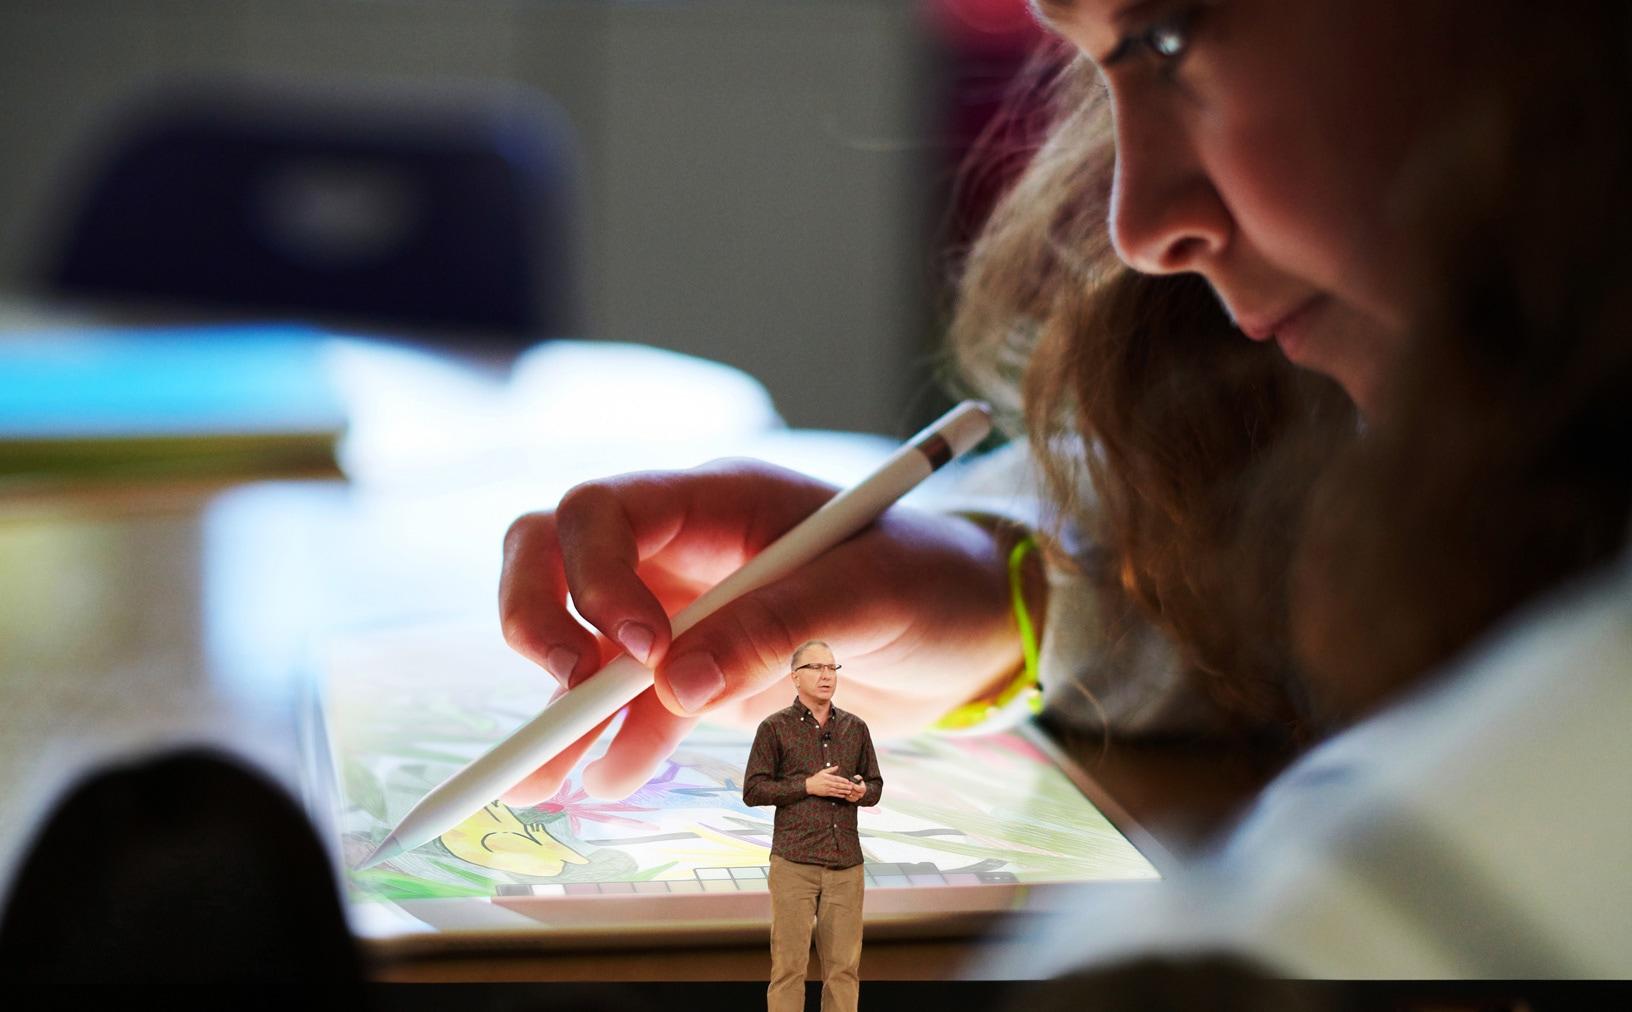 Greg Joswiak apresentando o novo iPad de 9,7 polegadas